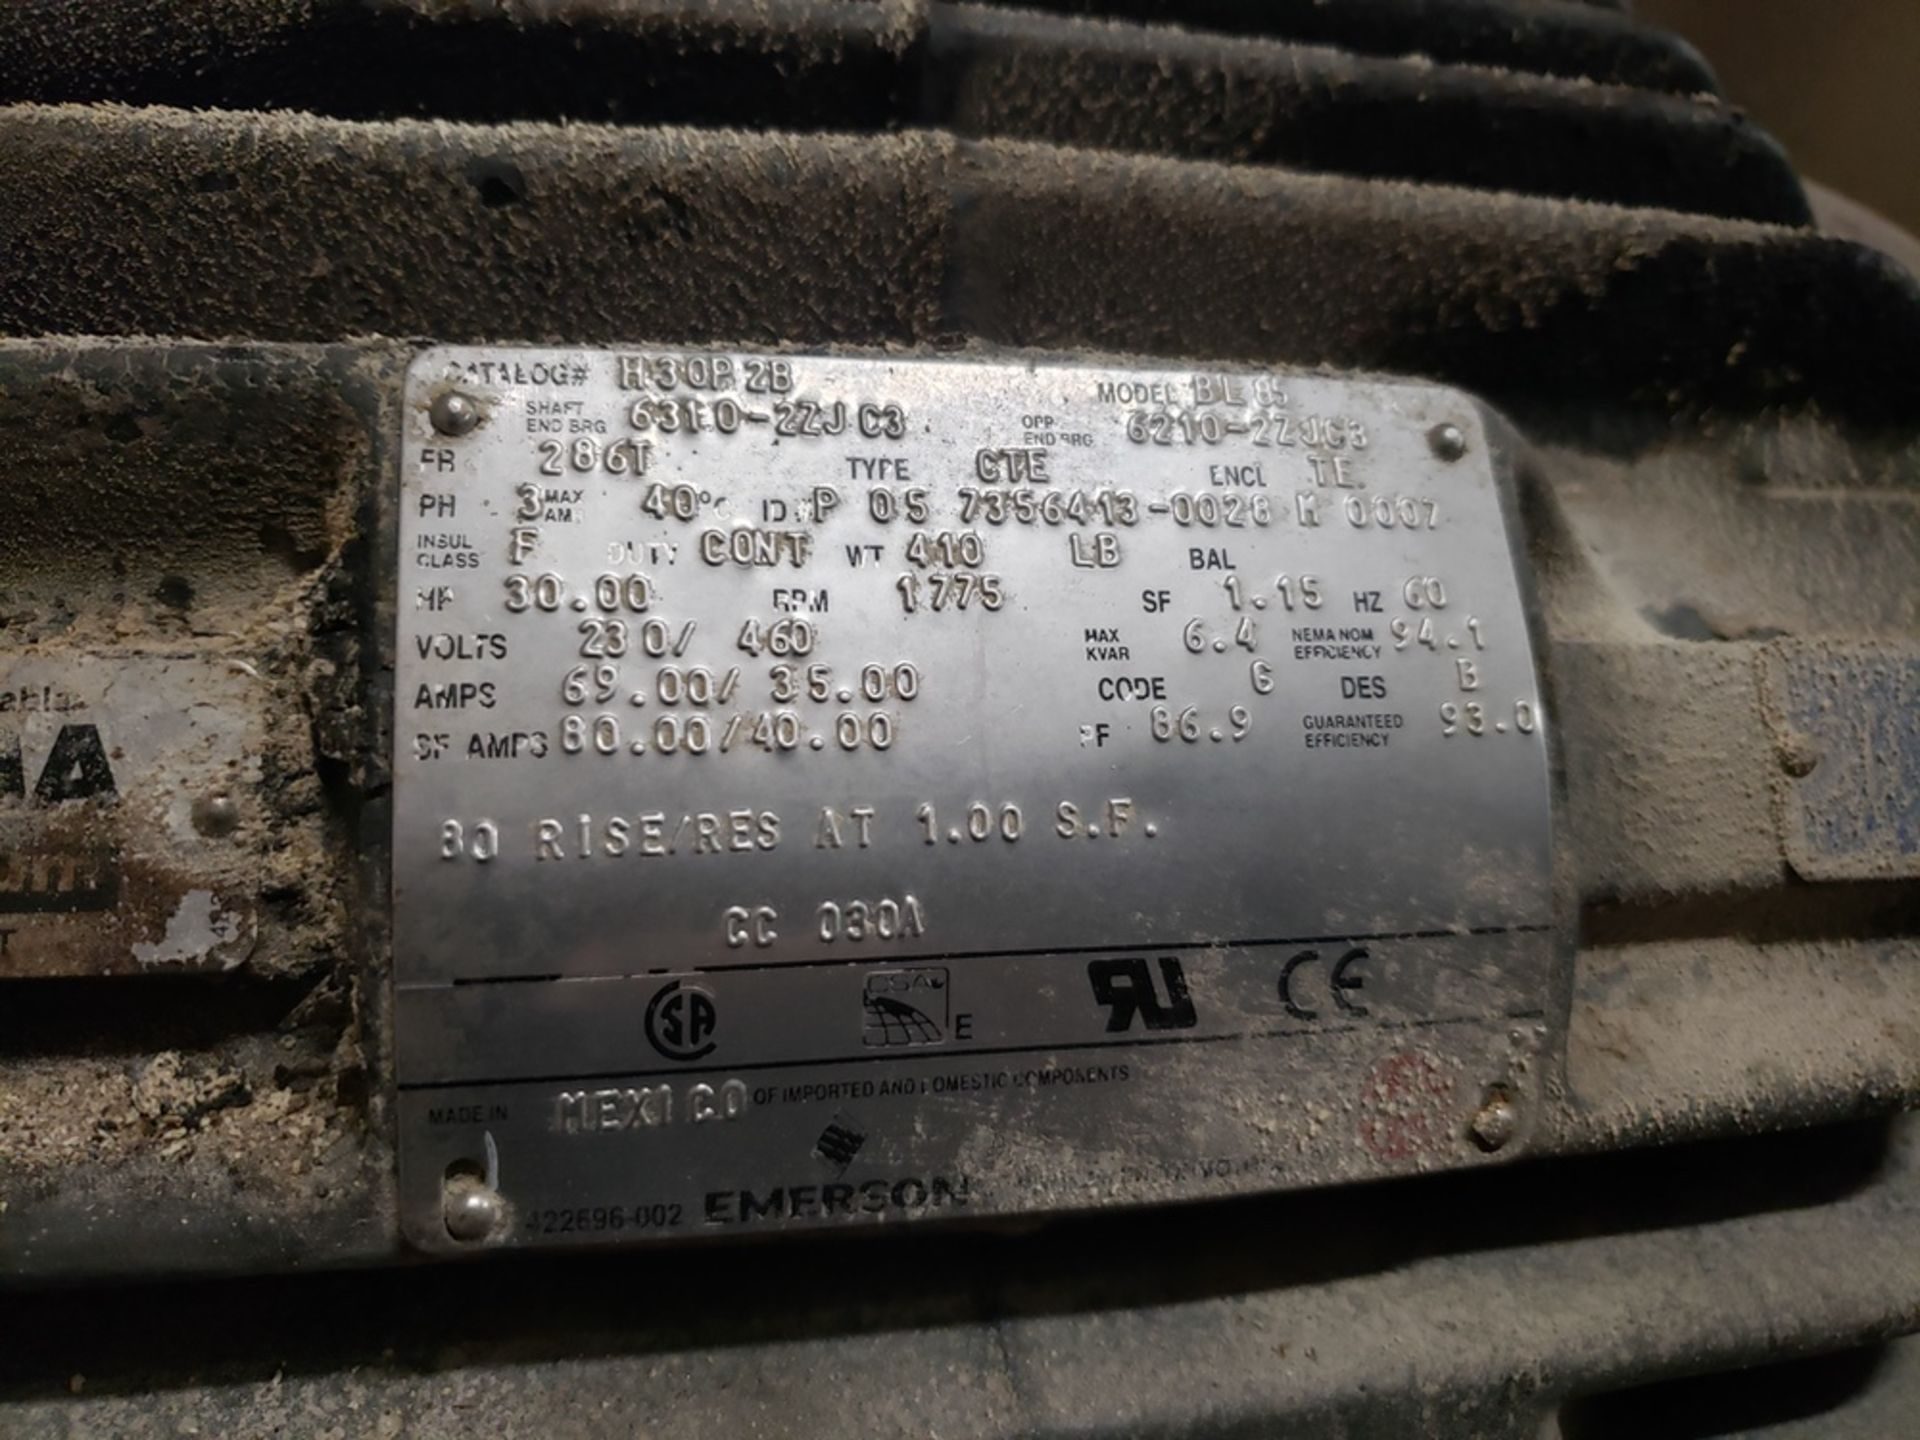 Lot 308 - 30 HP Blower Skid | Rig Fee: $400